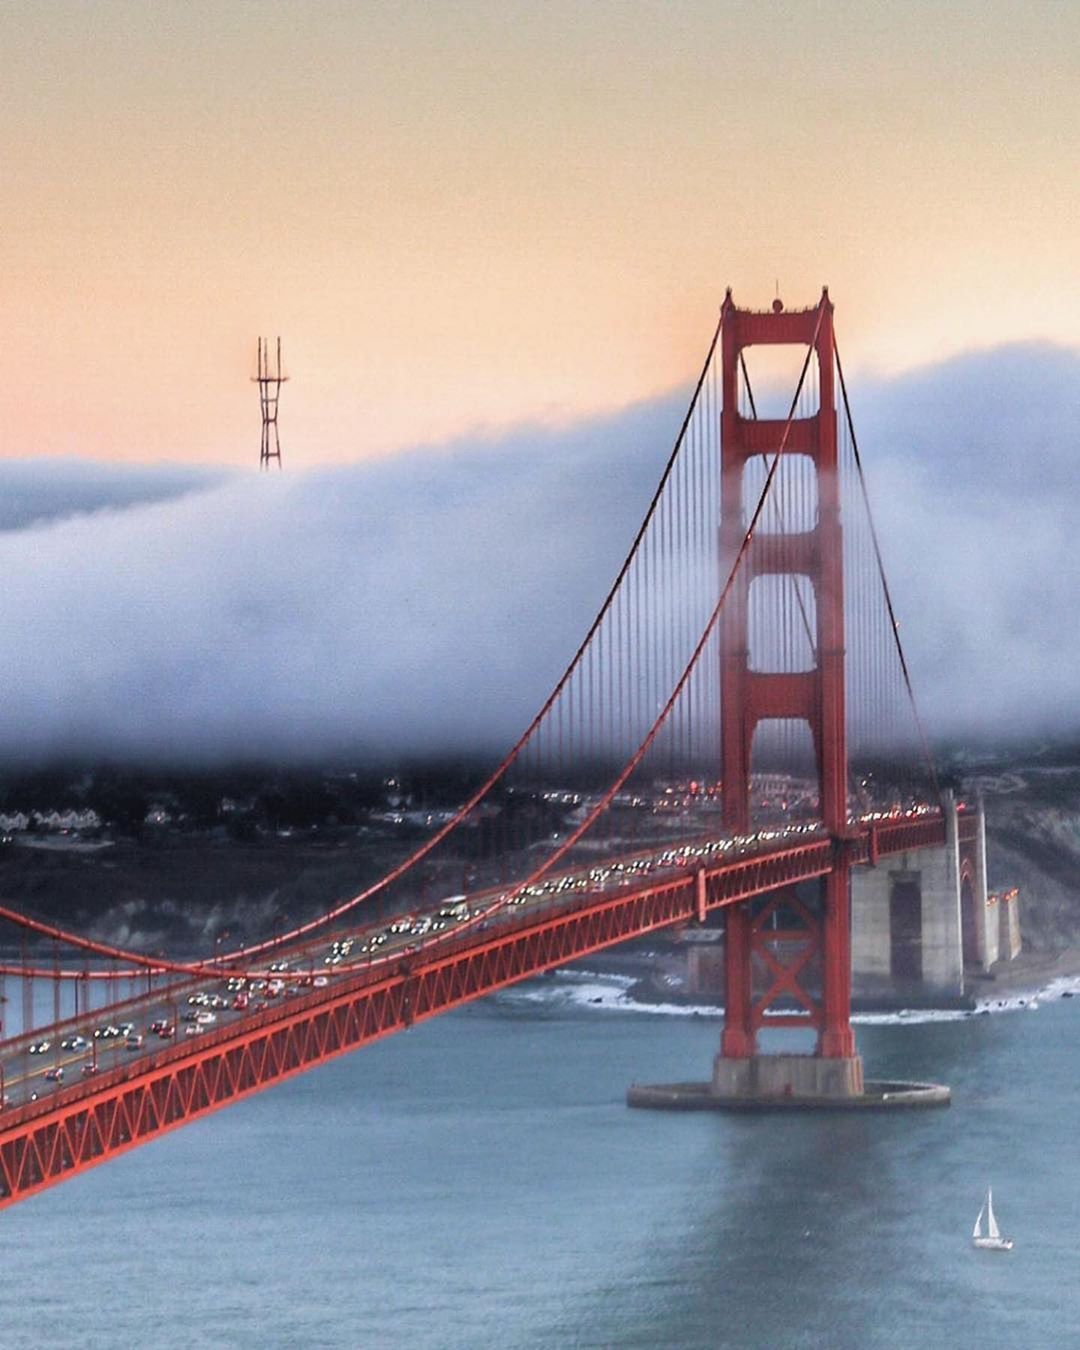 San Francisco Now Forever On Instagram Thick Fog Rolling On The Golden Gate Bridge San Francisco Golden Gate Bridge Golden Gate Bridge San Francisco Bridge